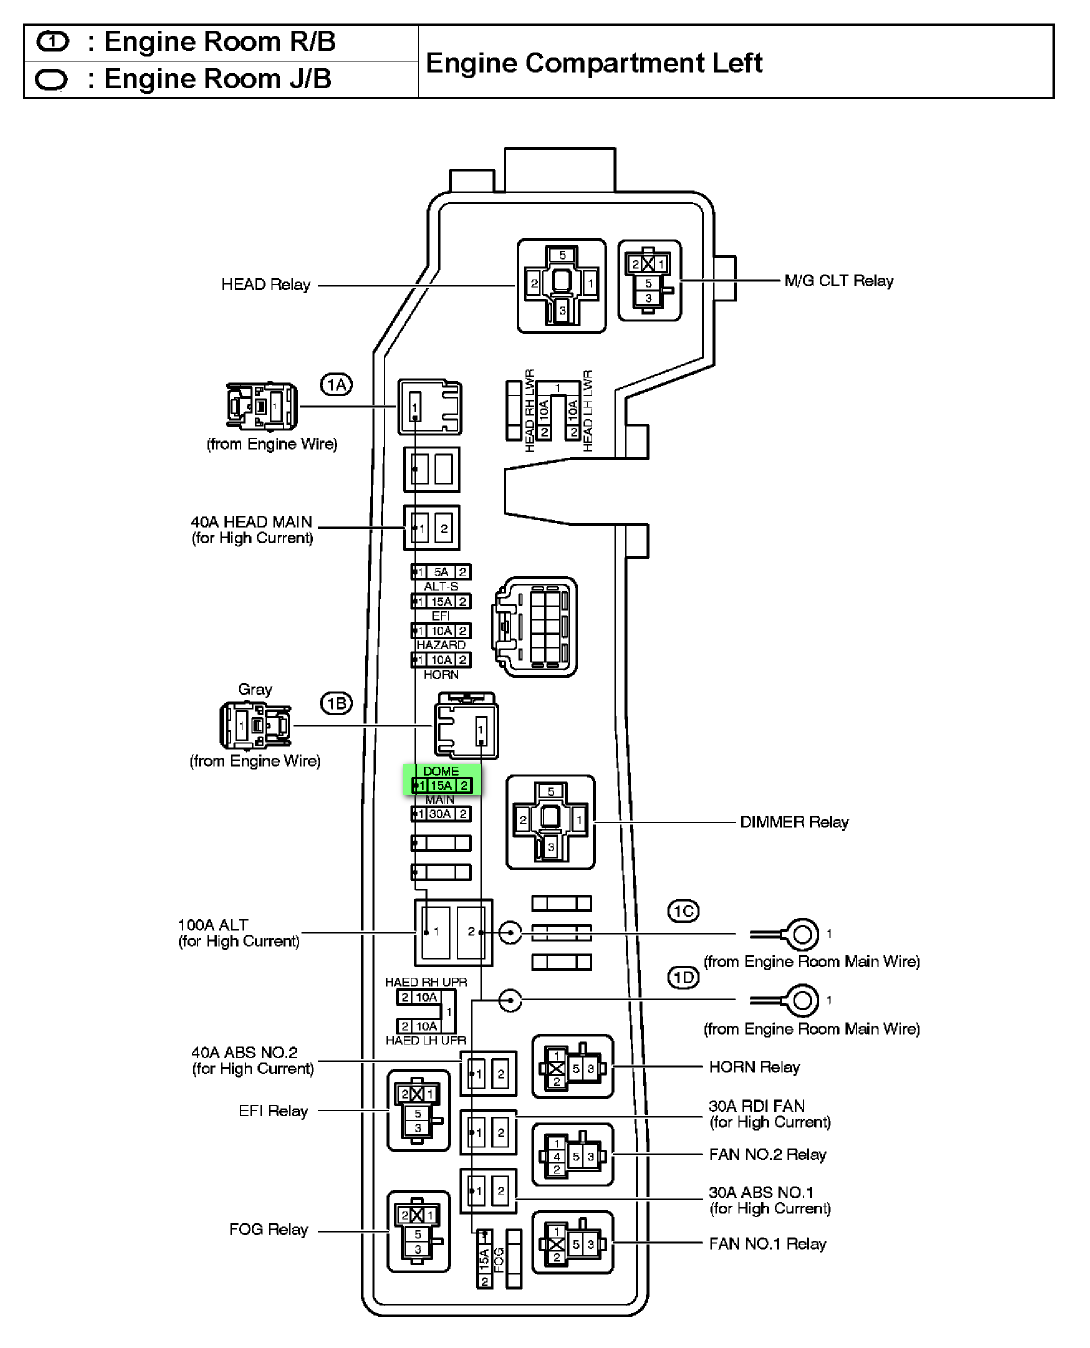 toyota corolla 2006 fuse box diagram | 2004 toyota corolla